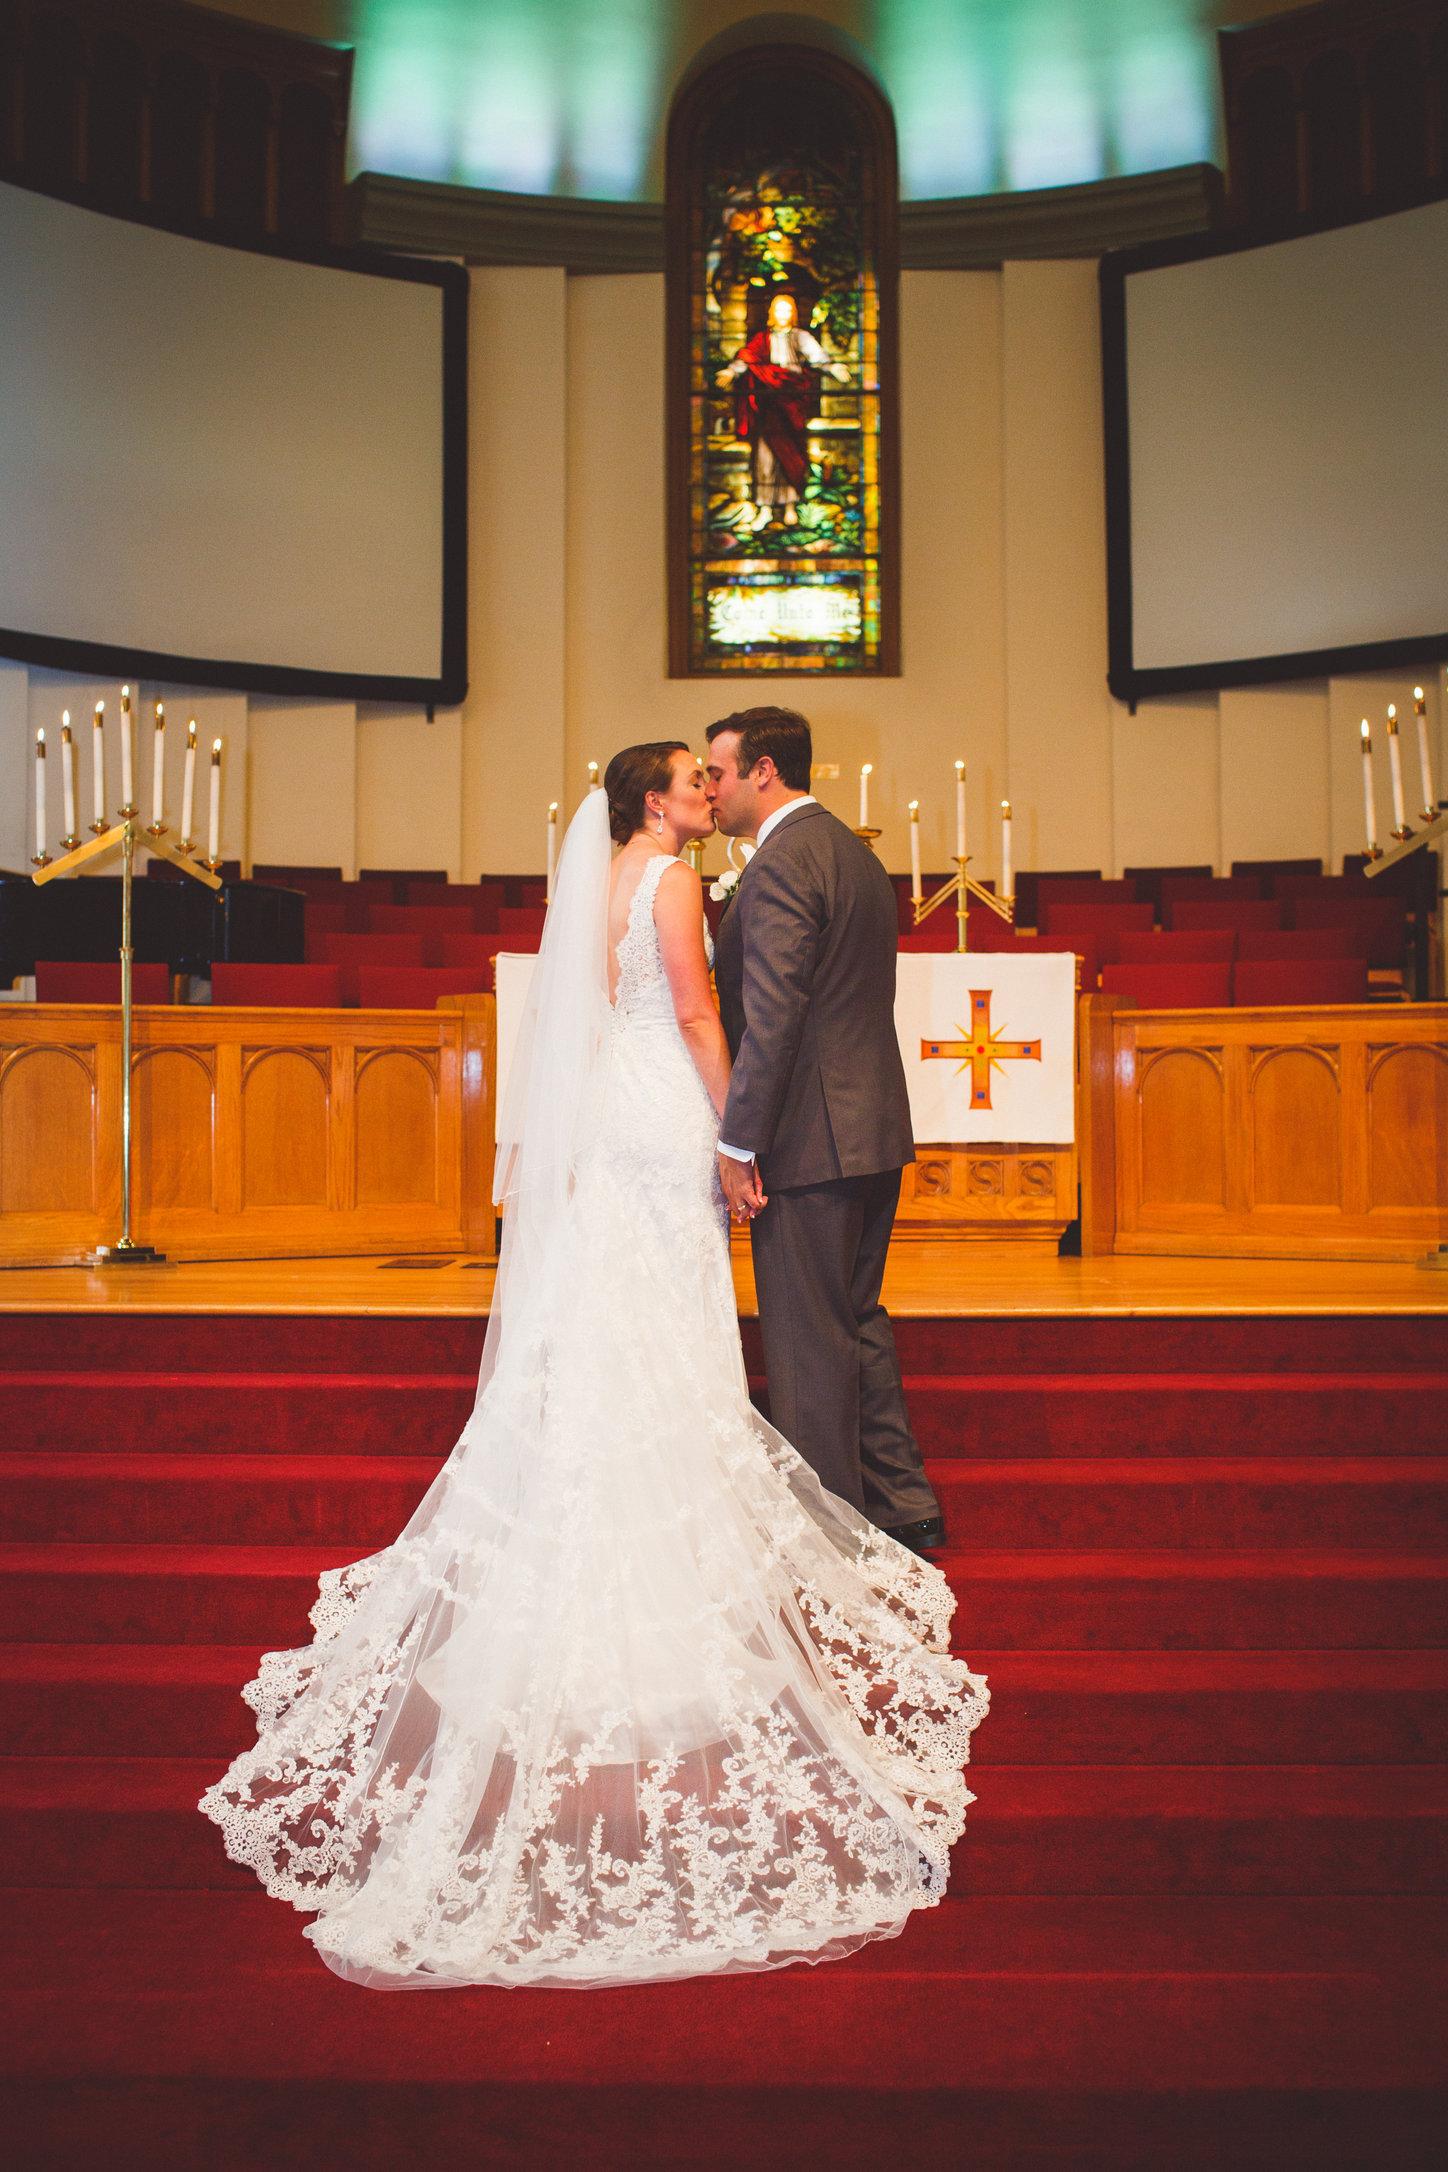 SandC-wedding-293.jpg